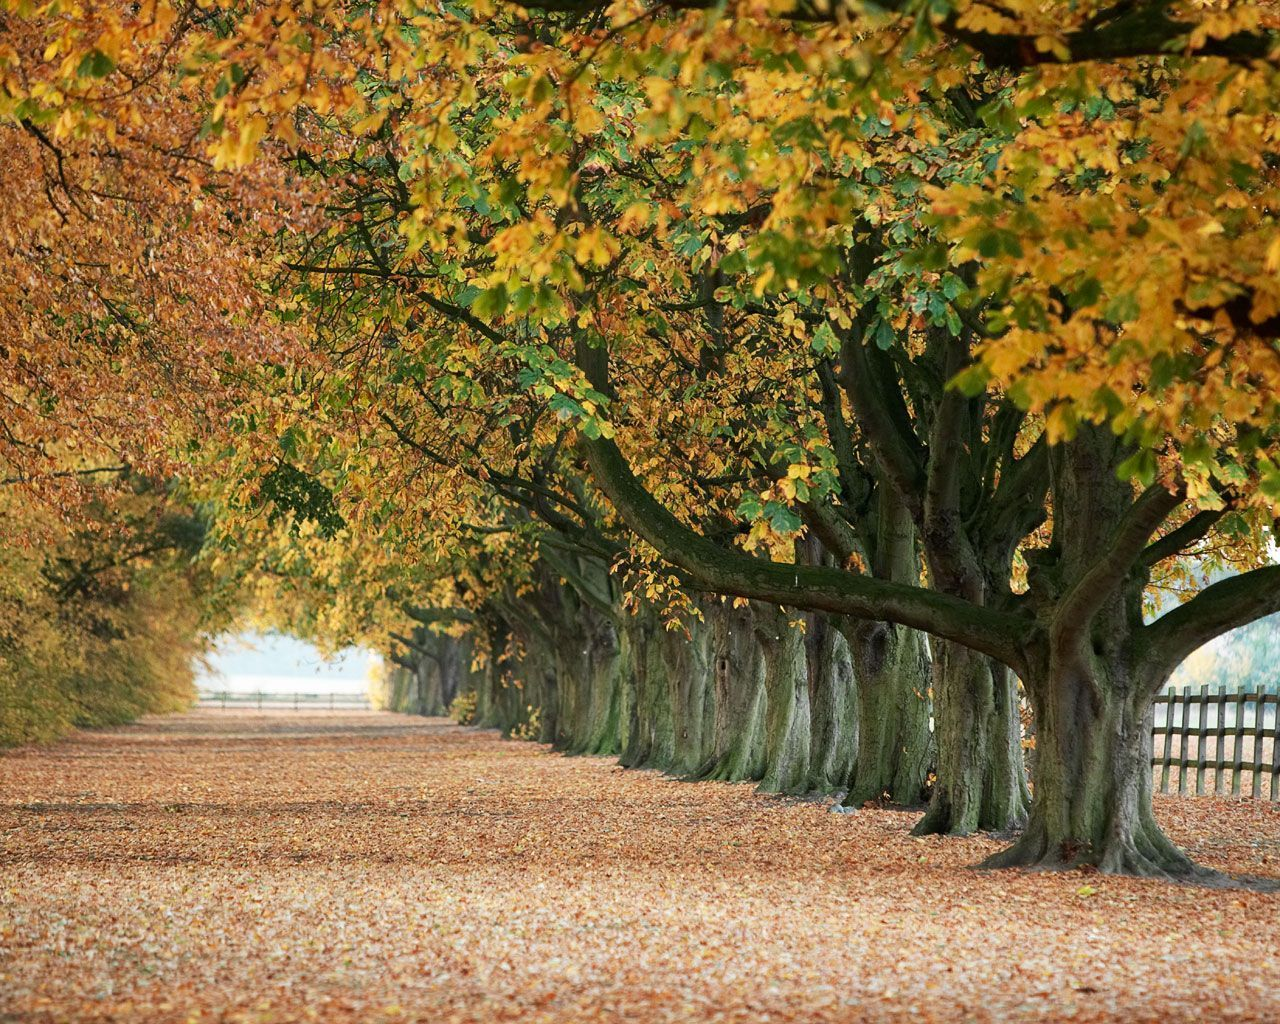 Autumn s concerto wallpaper - Free Autumn Screensavers Wallpaper 1280 1024 Free Fall Screensavers Wallpapers 40 Wallpapers